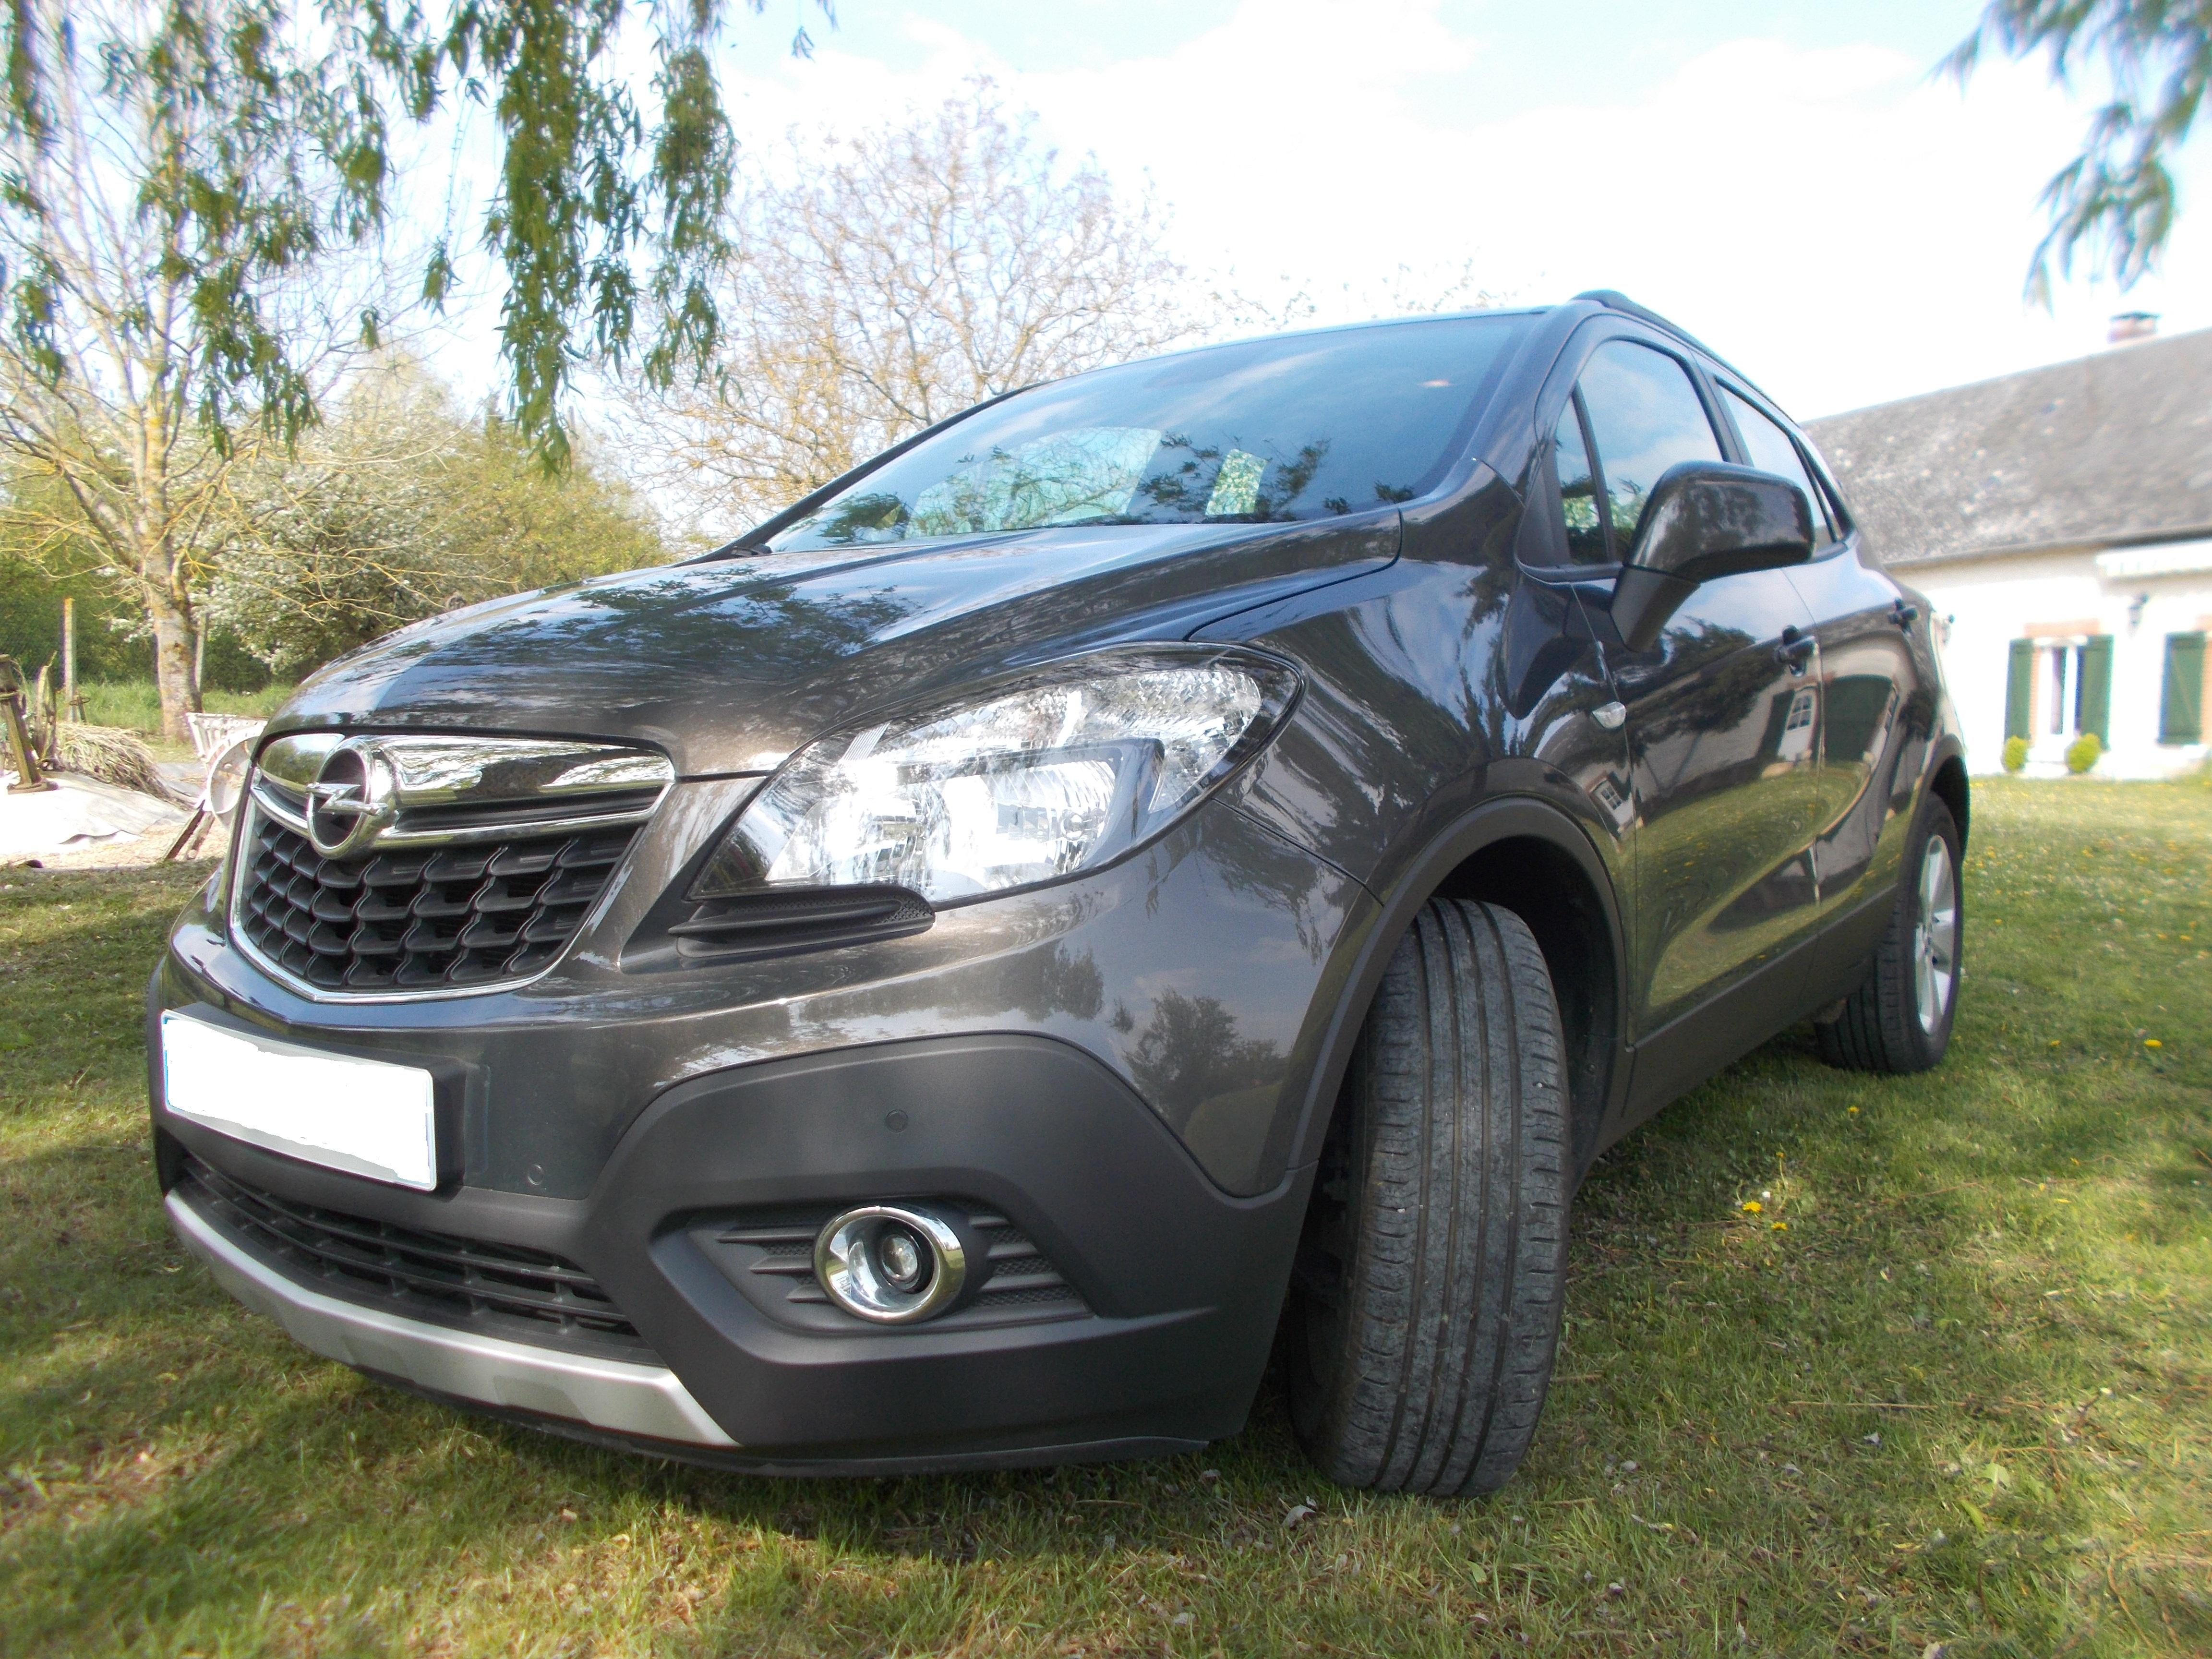 39600 km Opel Mokka 1.6 CDTI 136 ch Auto